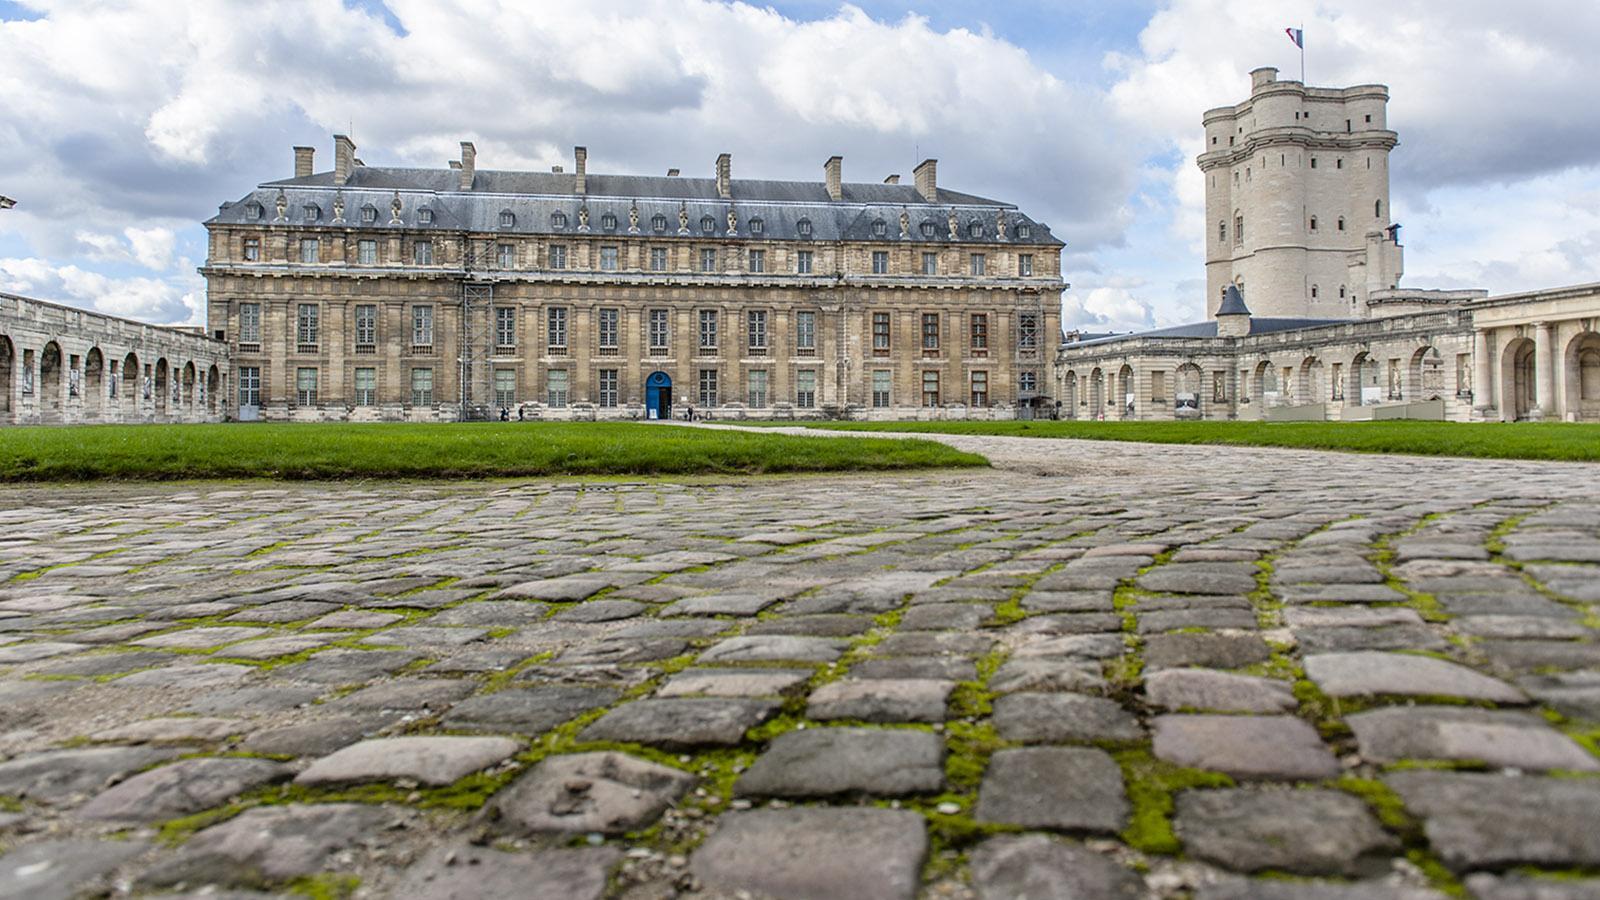 Der südliche Innenhof des Château de Vincennes. Foto: Hilke Maunder